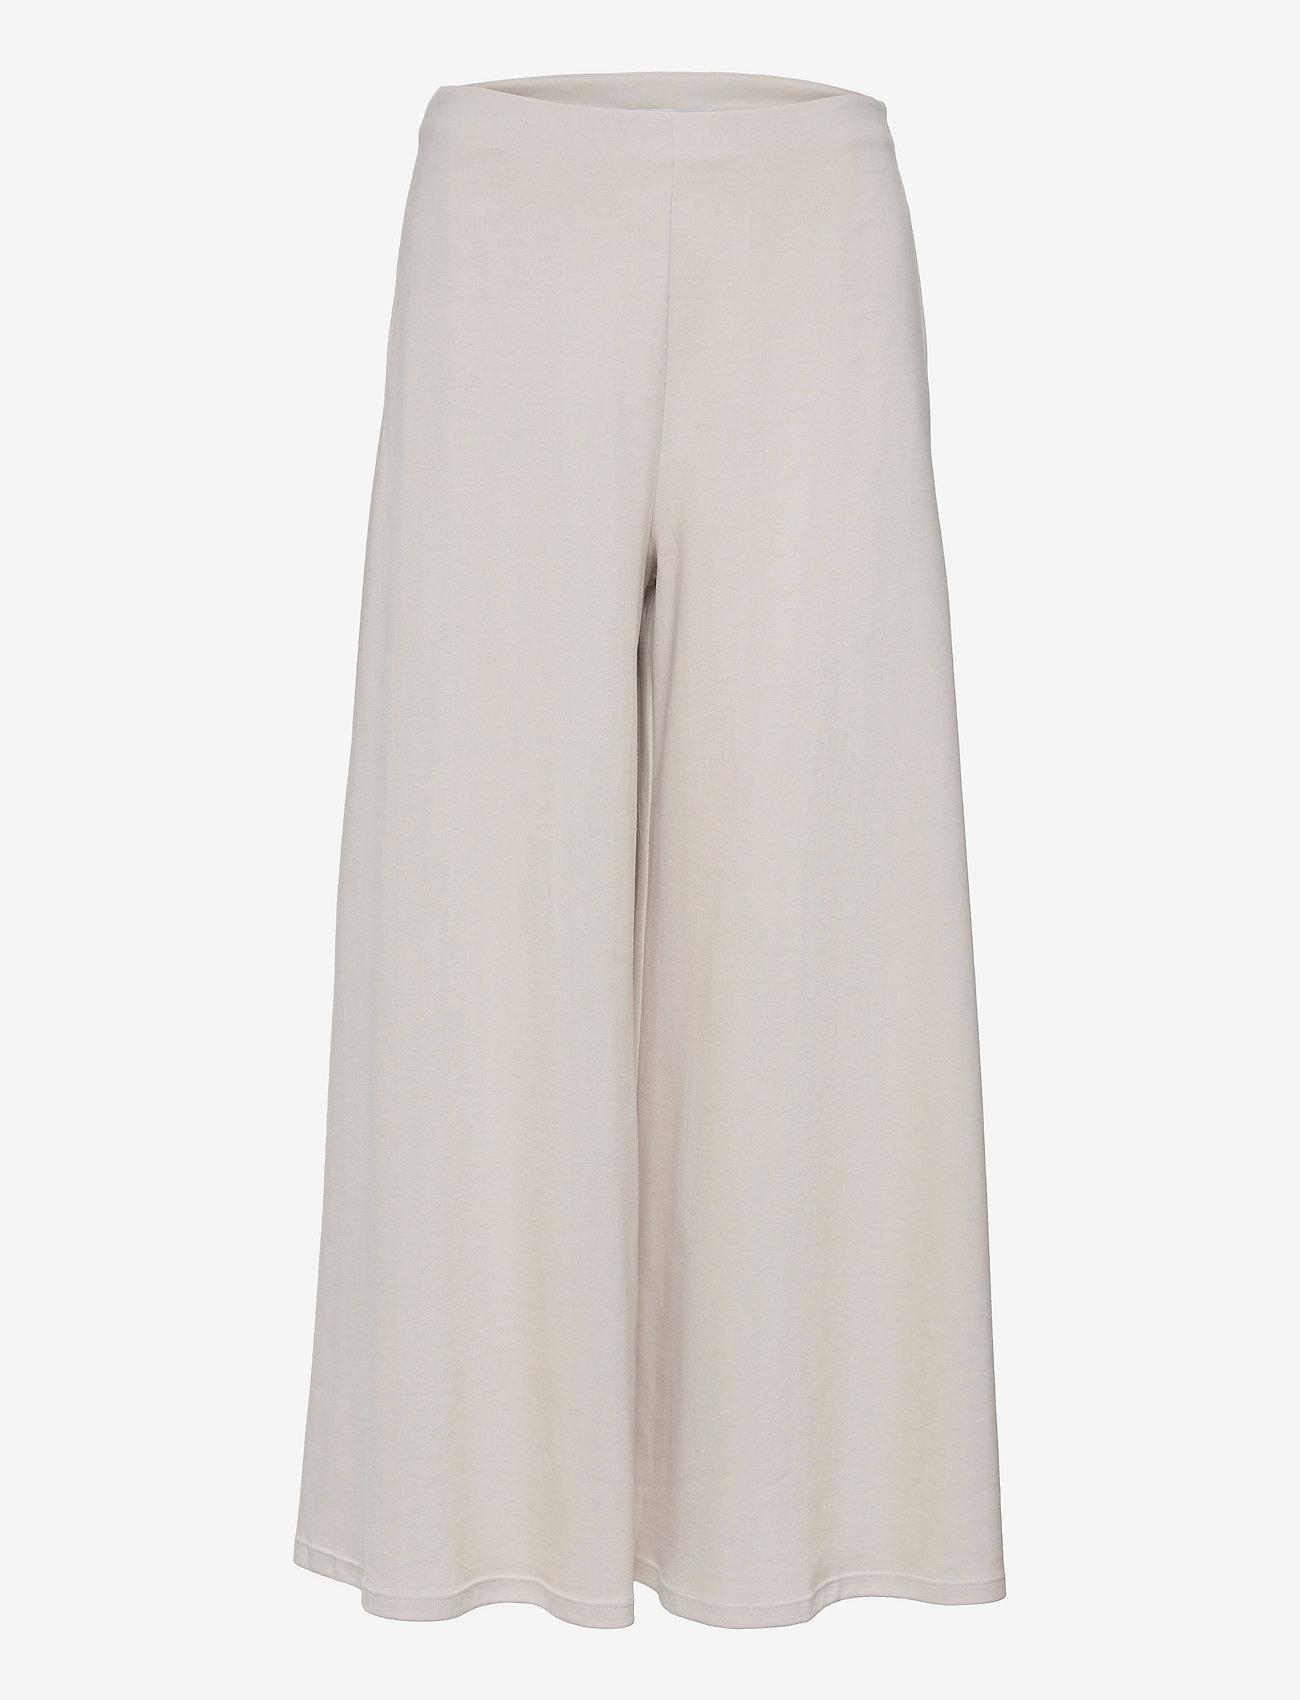 Max Mara Leisure - ESPERIA - wide leg trousers - beige - 0